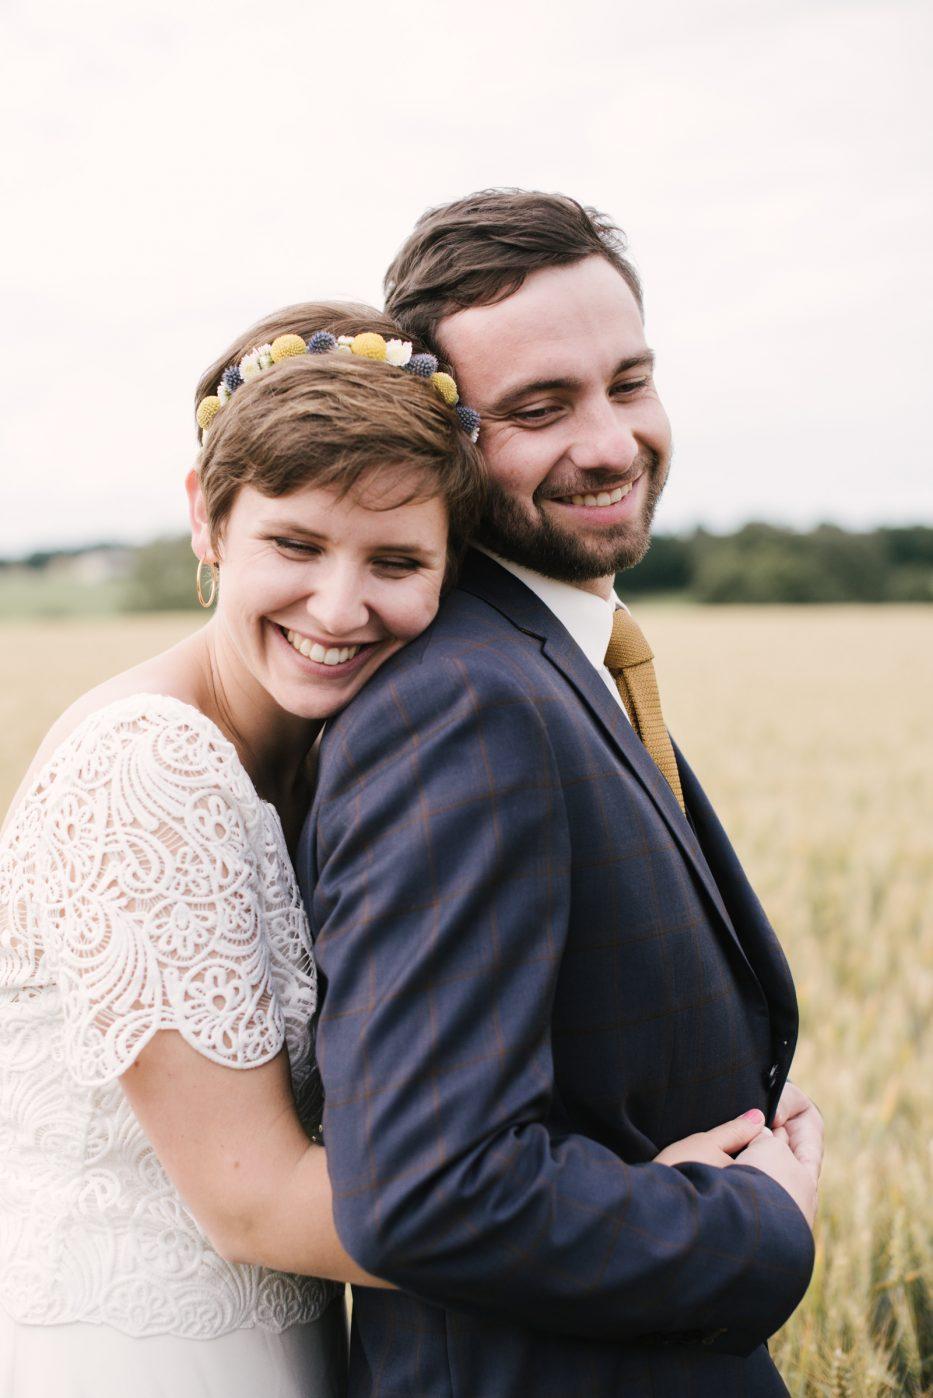 Lisebery photographe mariage famille entreprise grenoble lyon annecy chambery